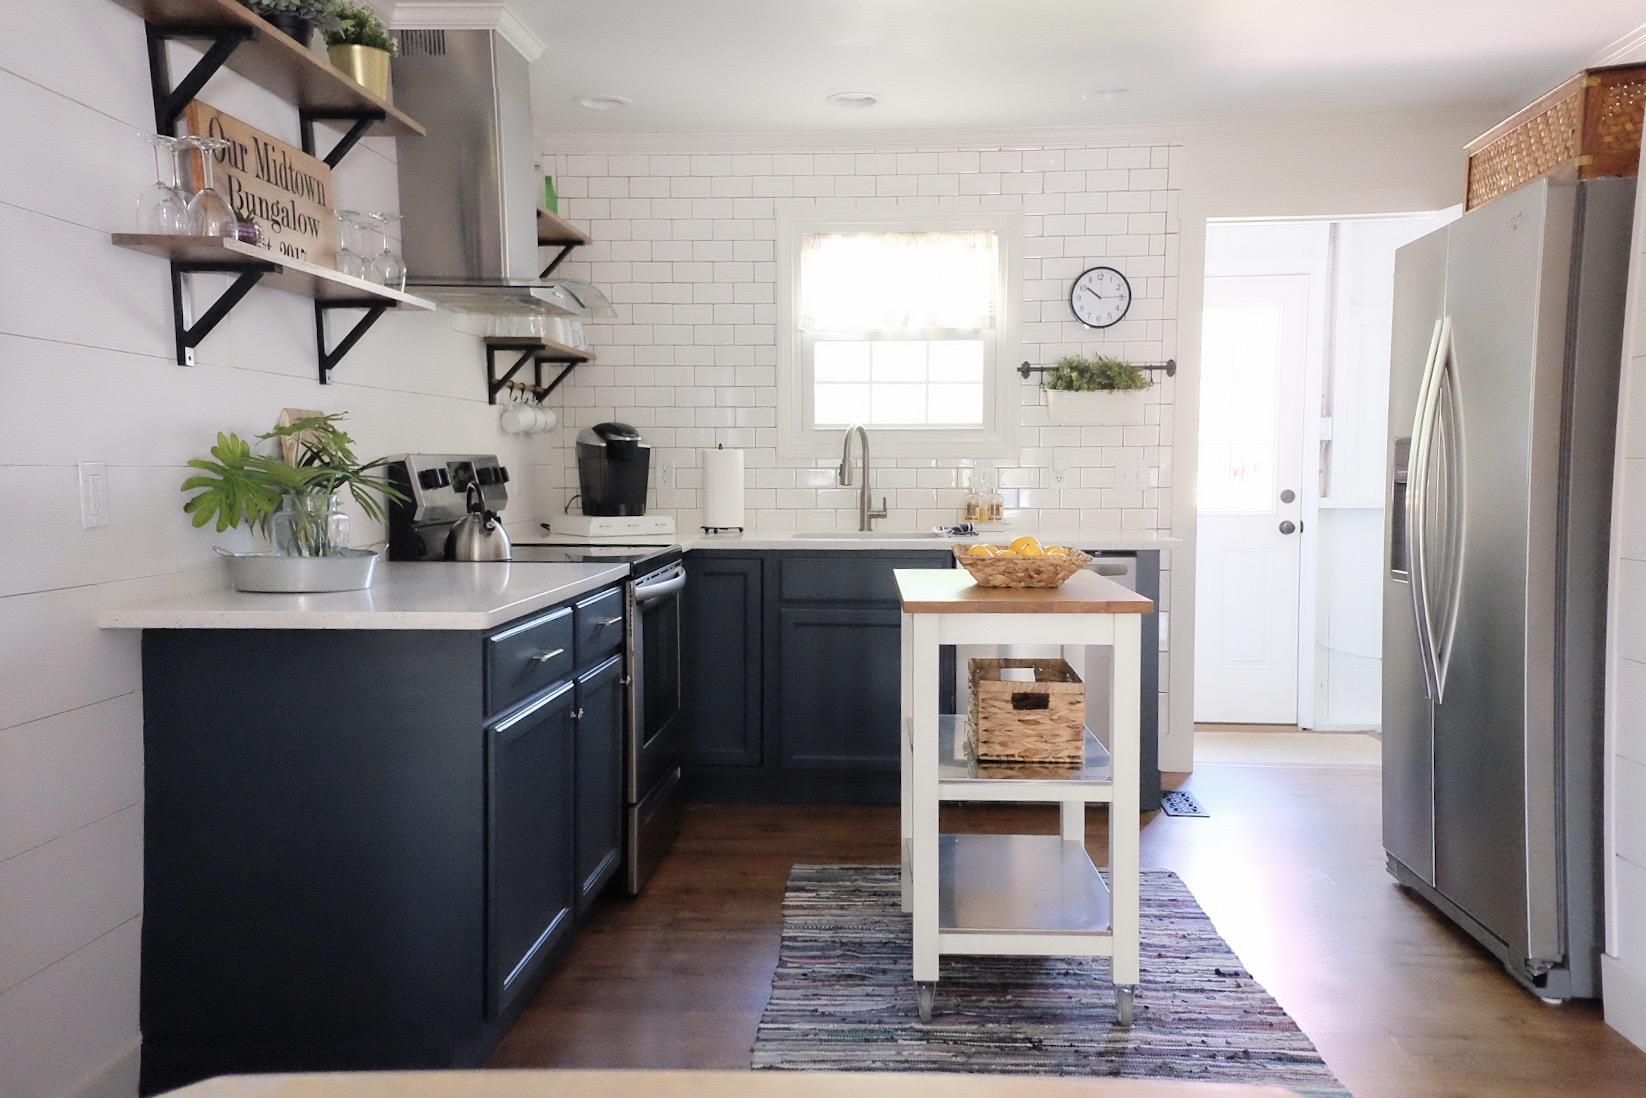 Painting Cabinets - Cottagestyleblog.com